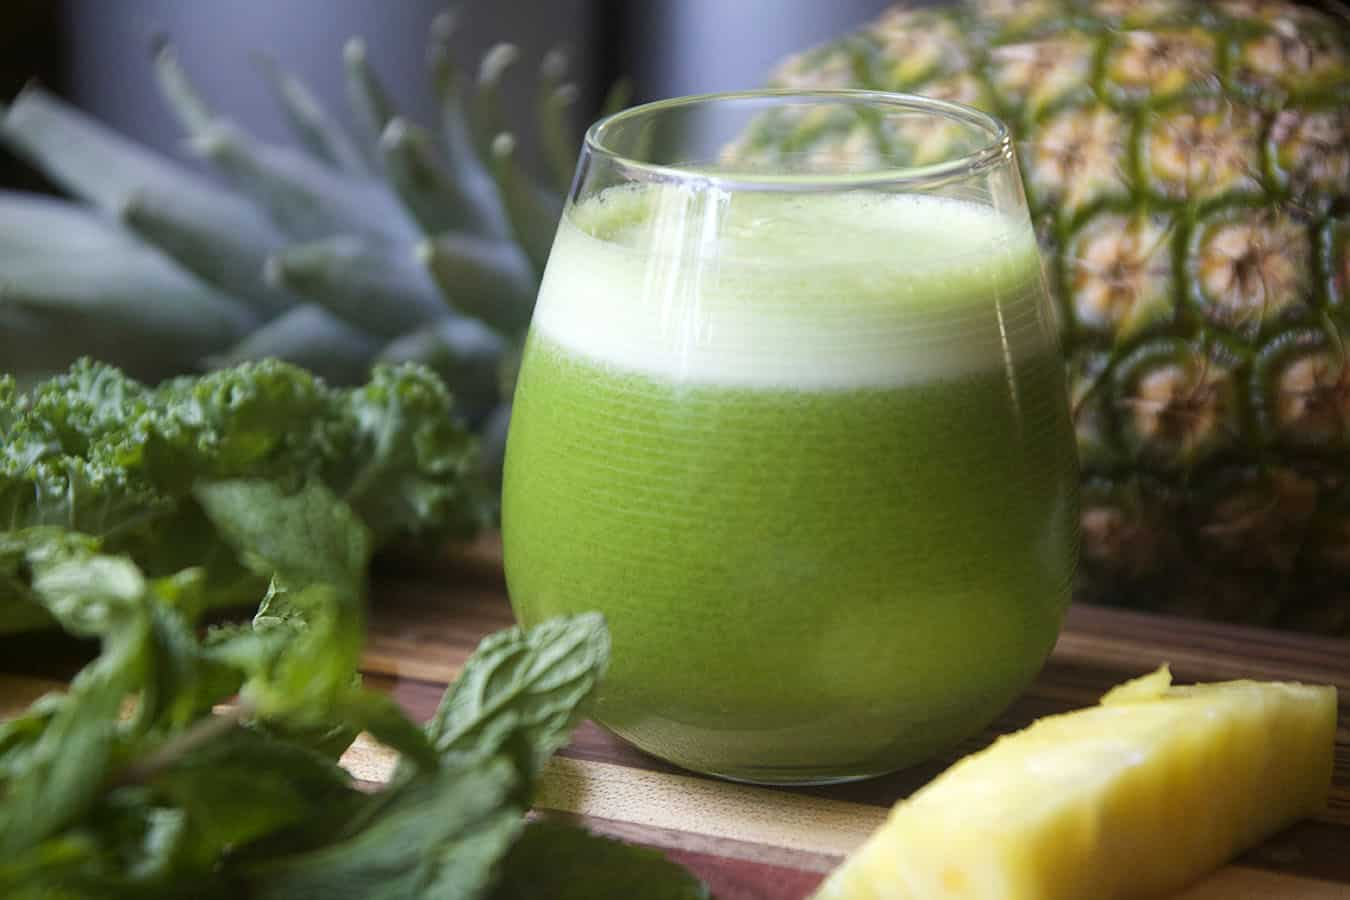 Pineapple green juice